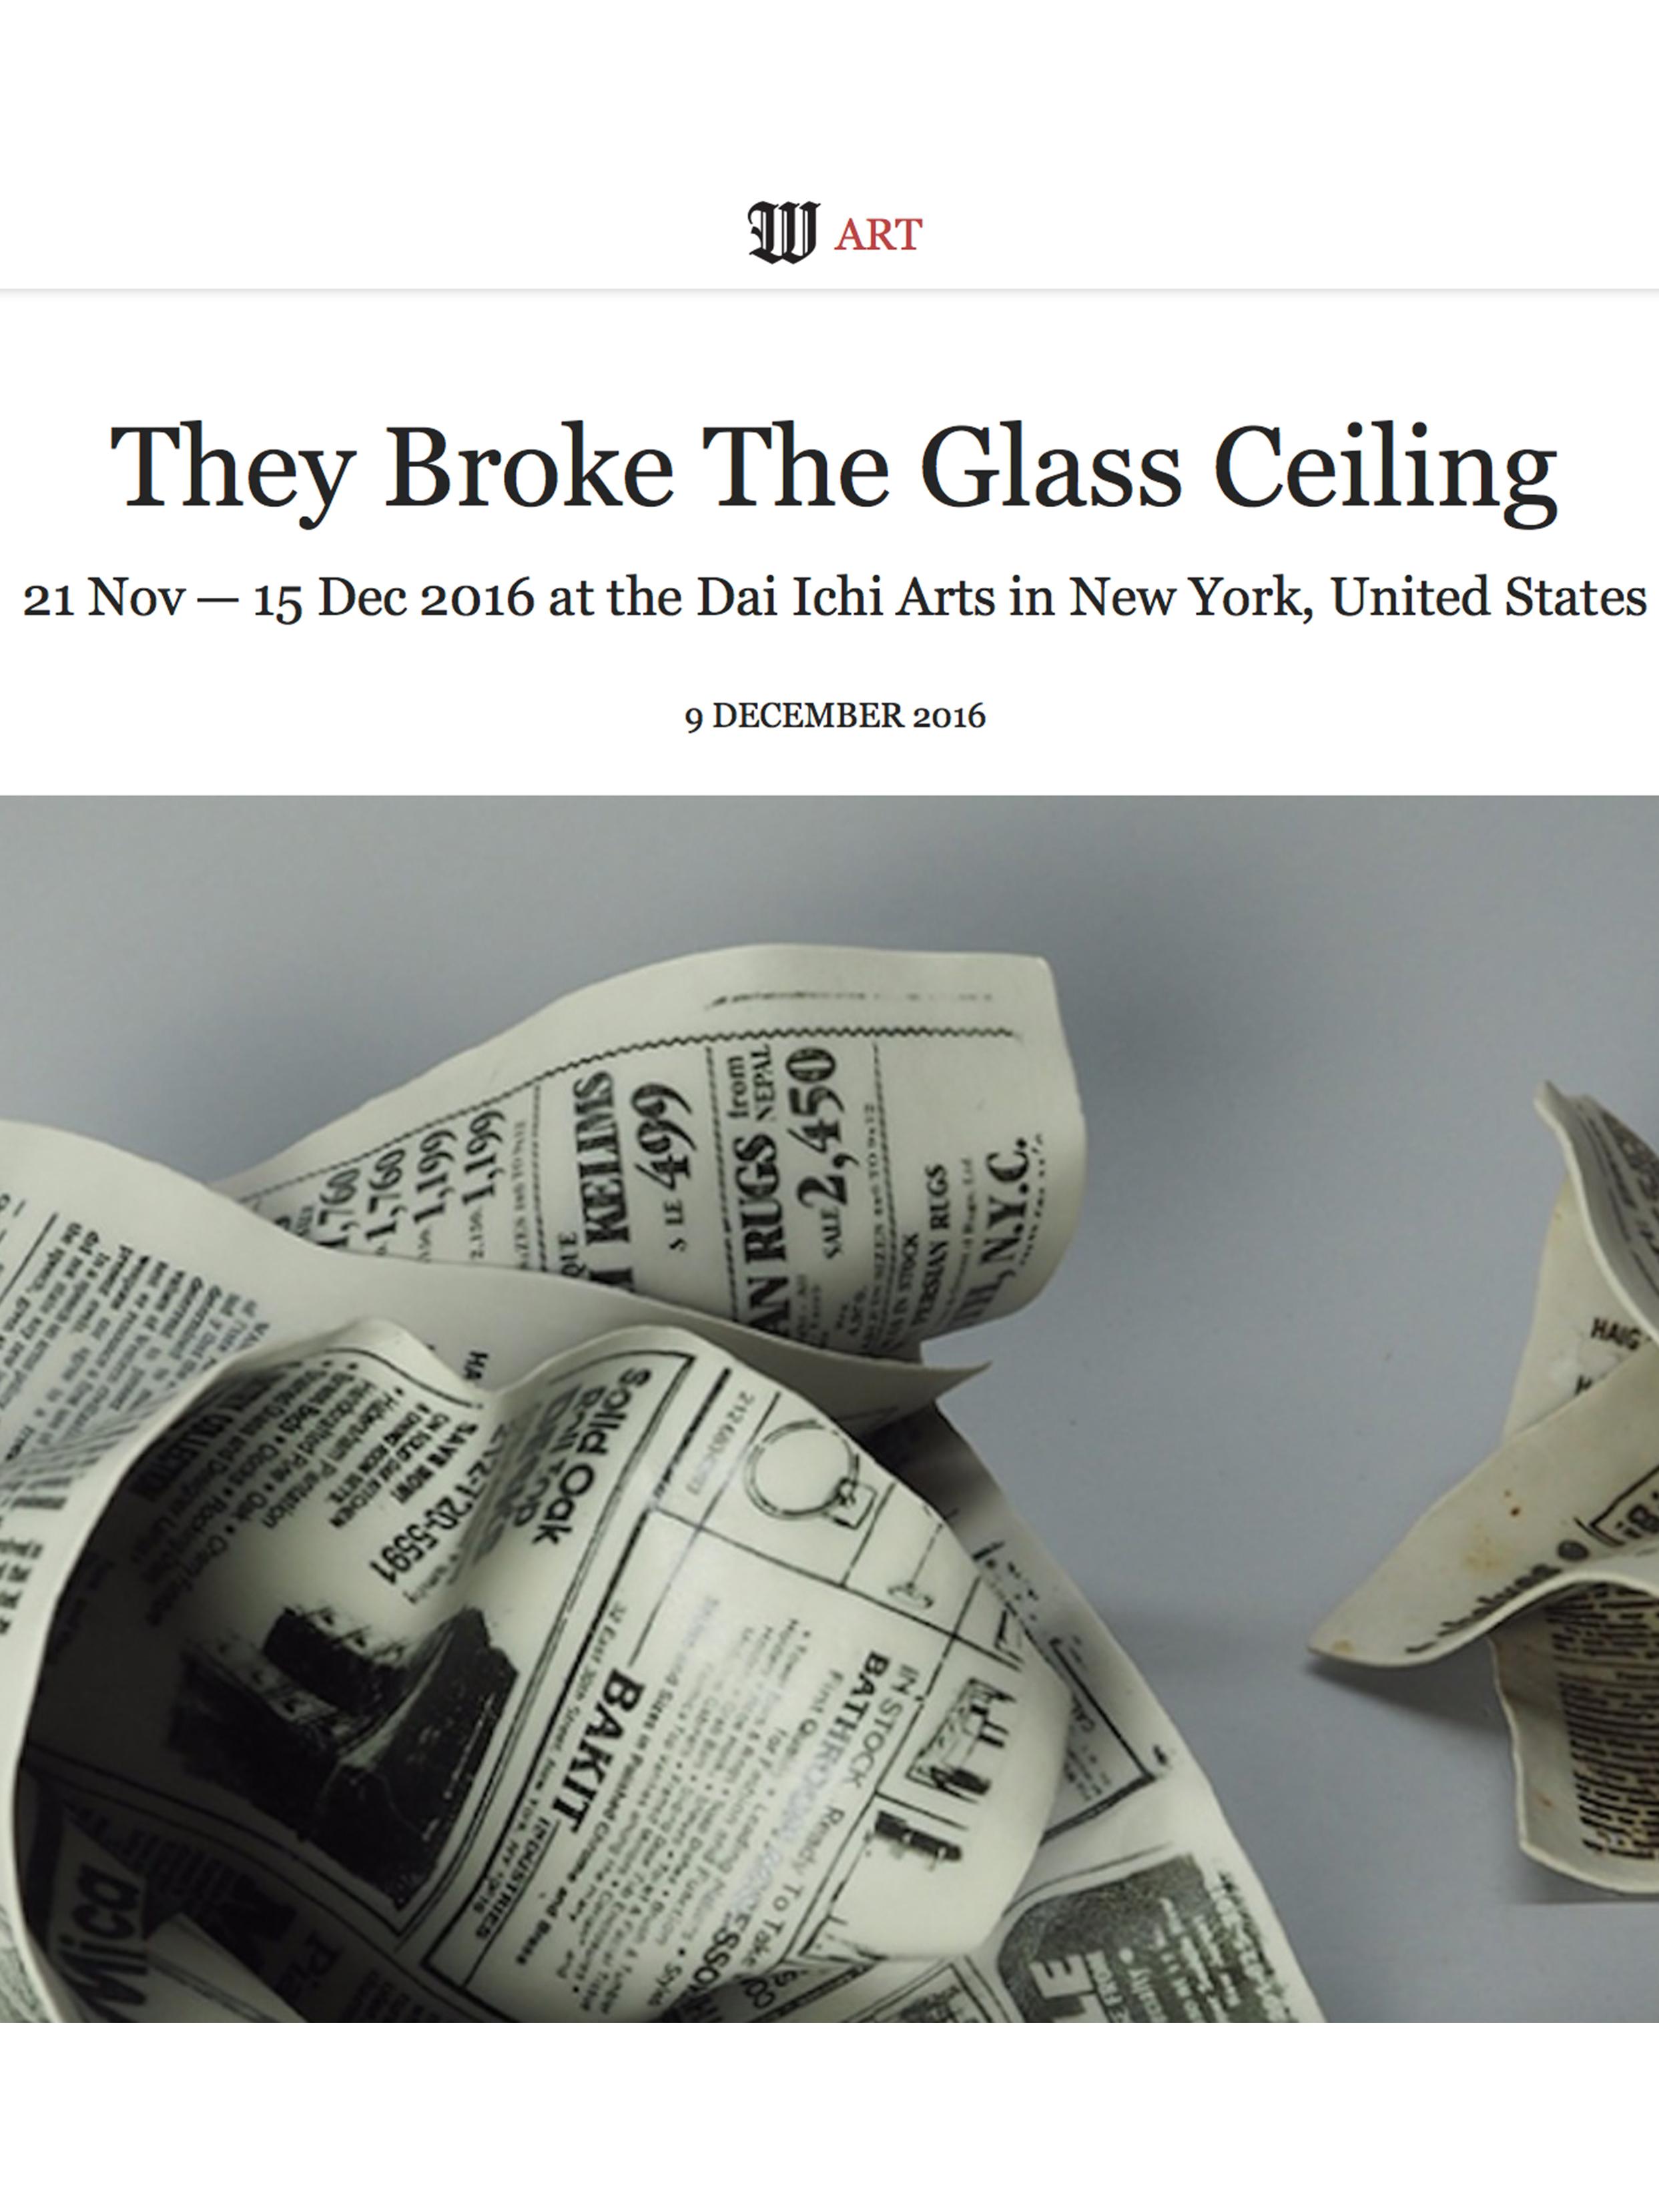 12/09/16 | Wall Street International Magazine : They Broke The Glass Ceiling